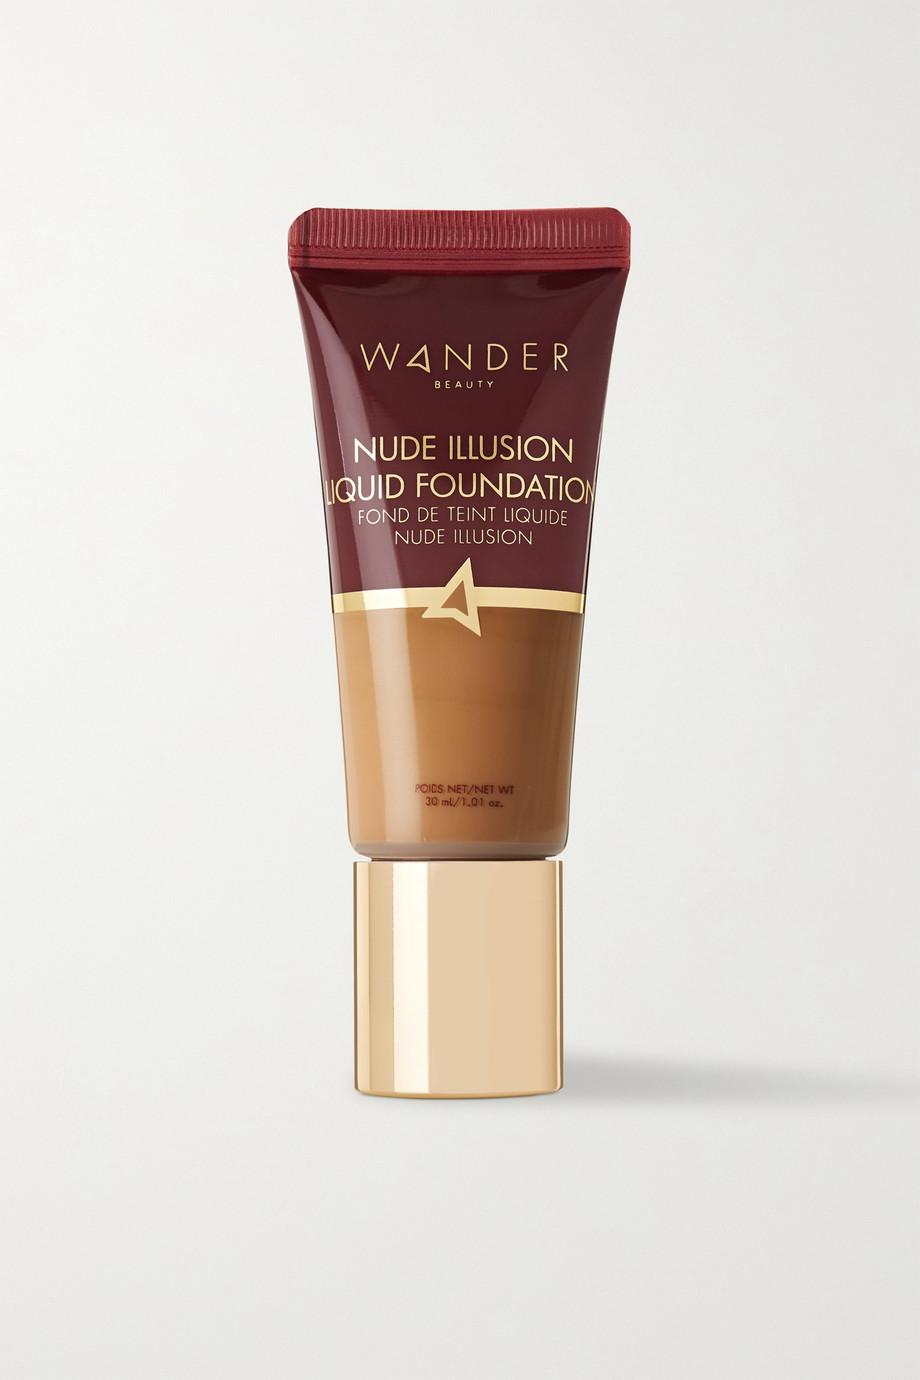 Wander Beauty Nude Illusion Liquid Foundation – Tan – Foundation